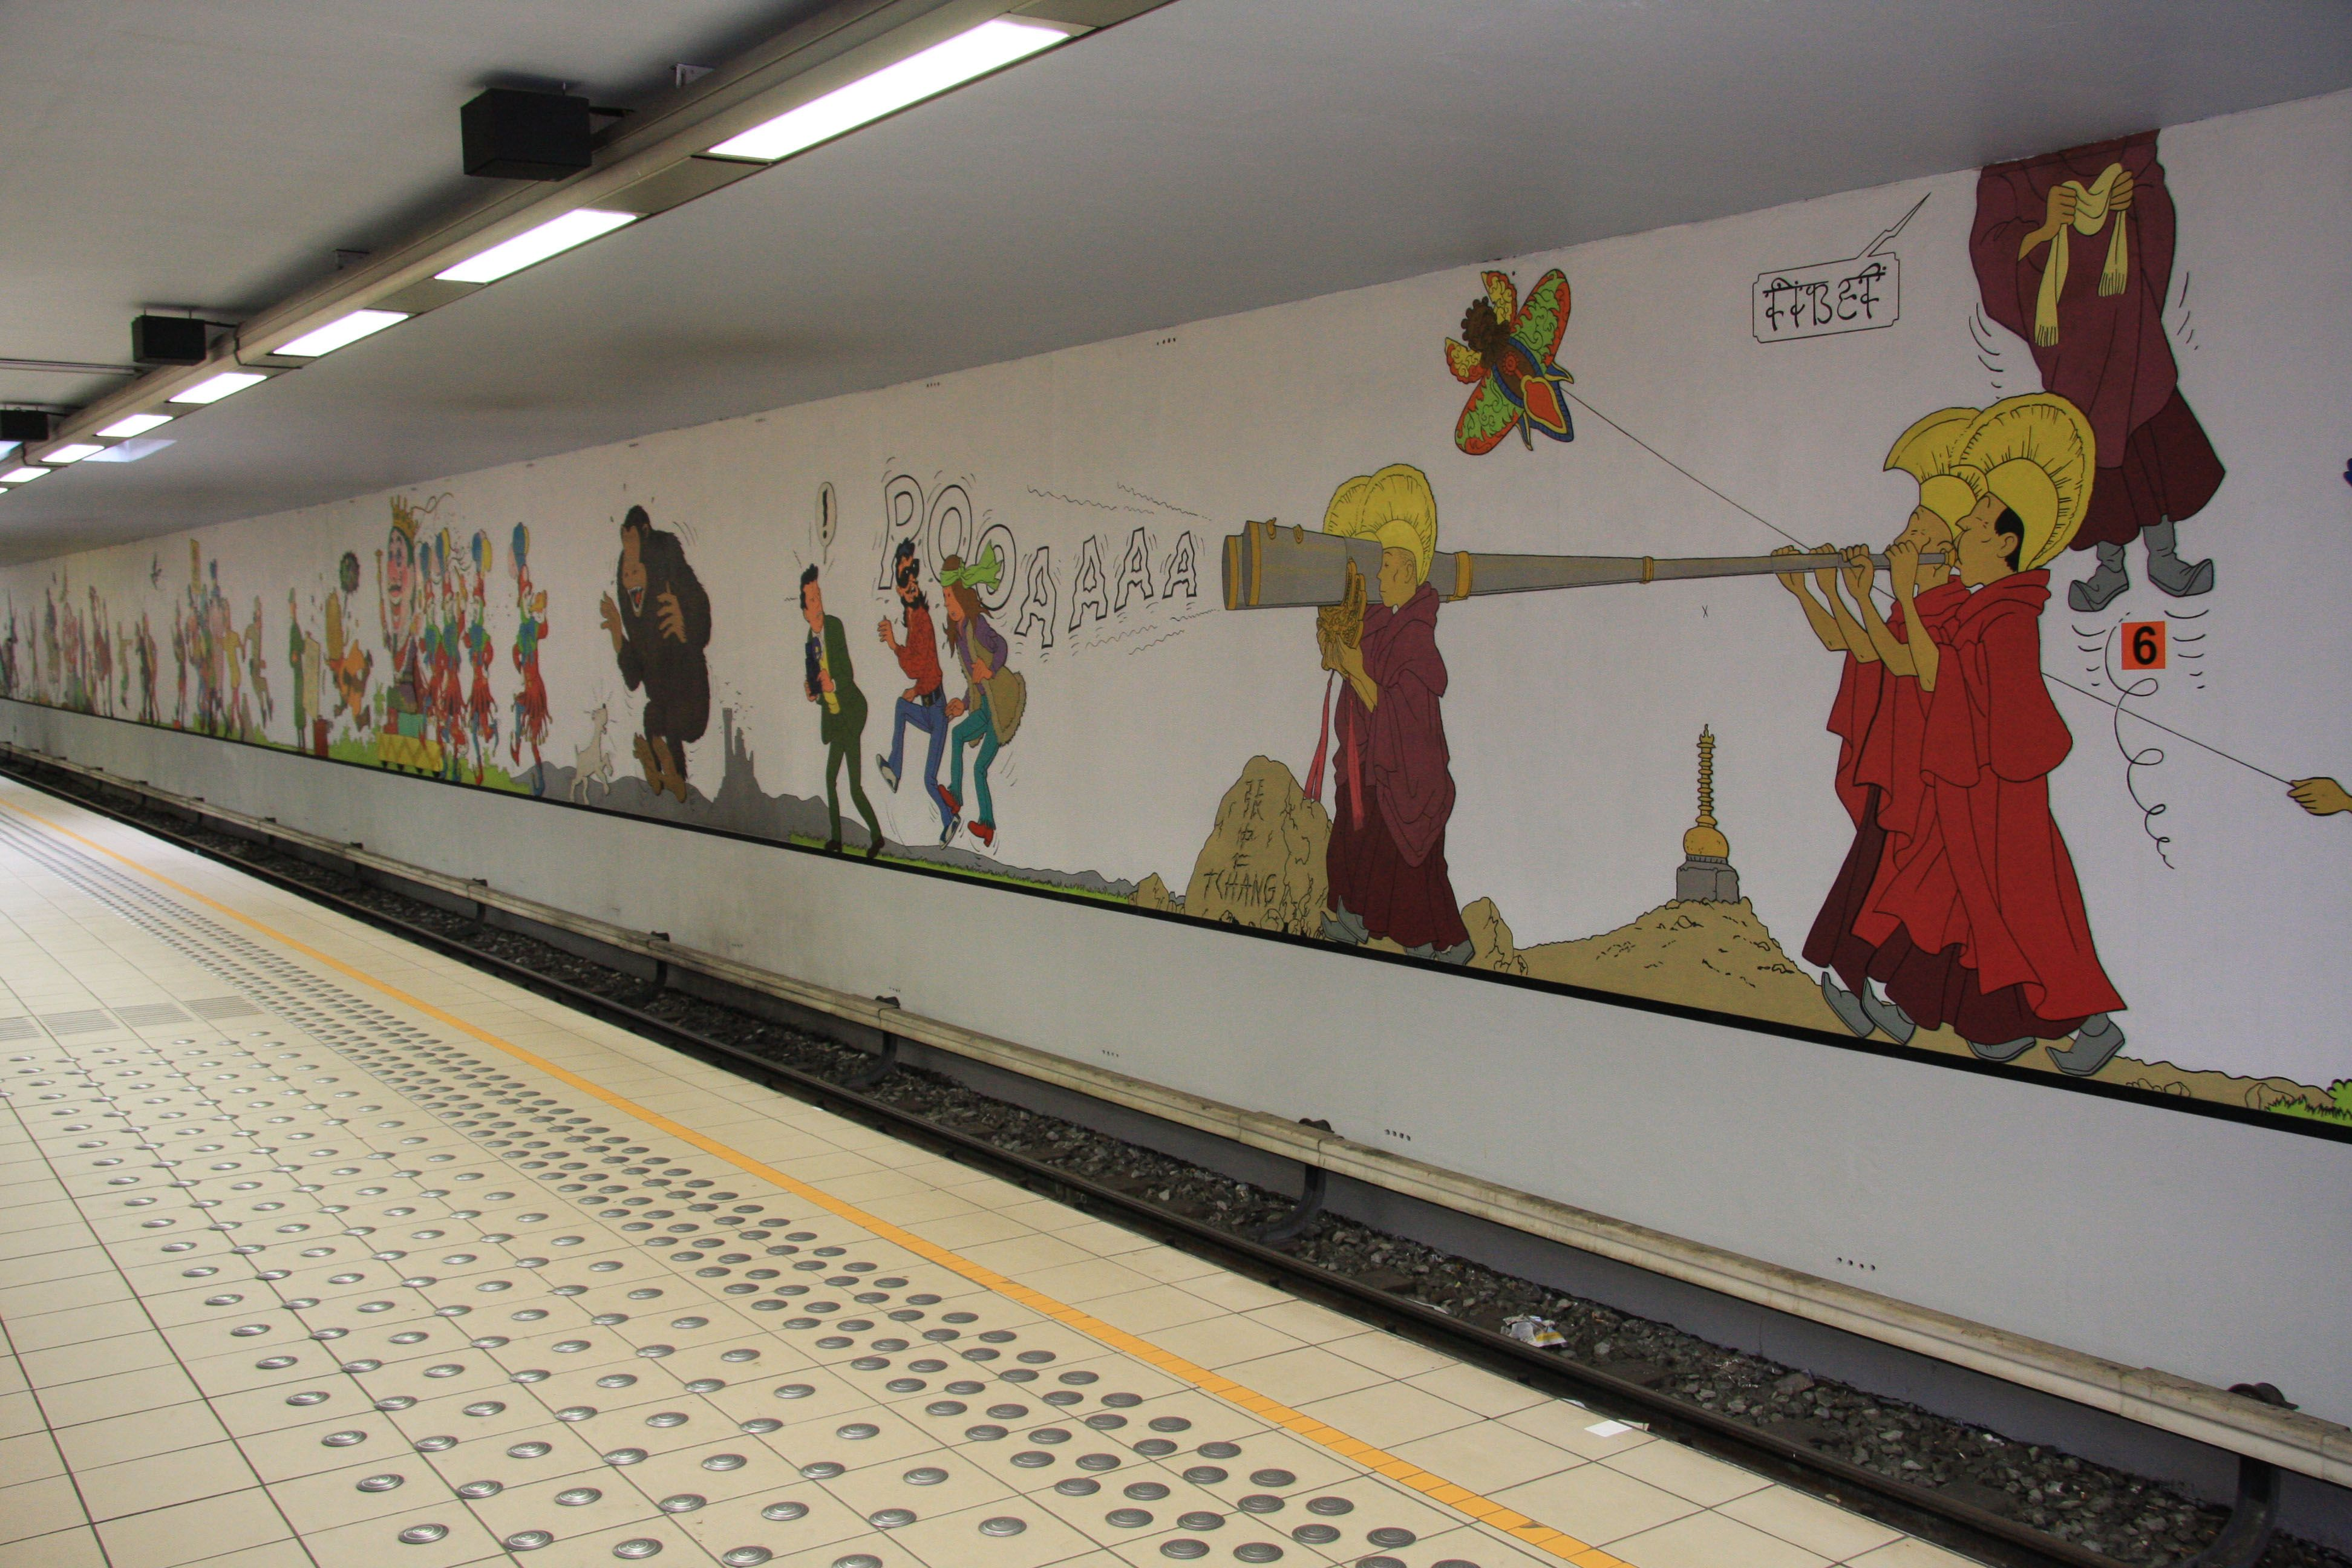 Tintin Mural At Stockel Metro Station Tintin Pinterest Tintin - Building in berlin gets transformed by amazing 137 foot tall starling mural